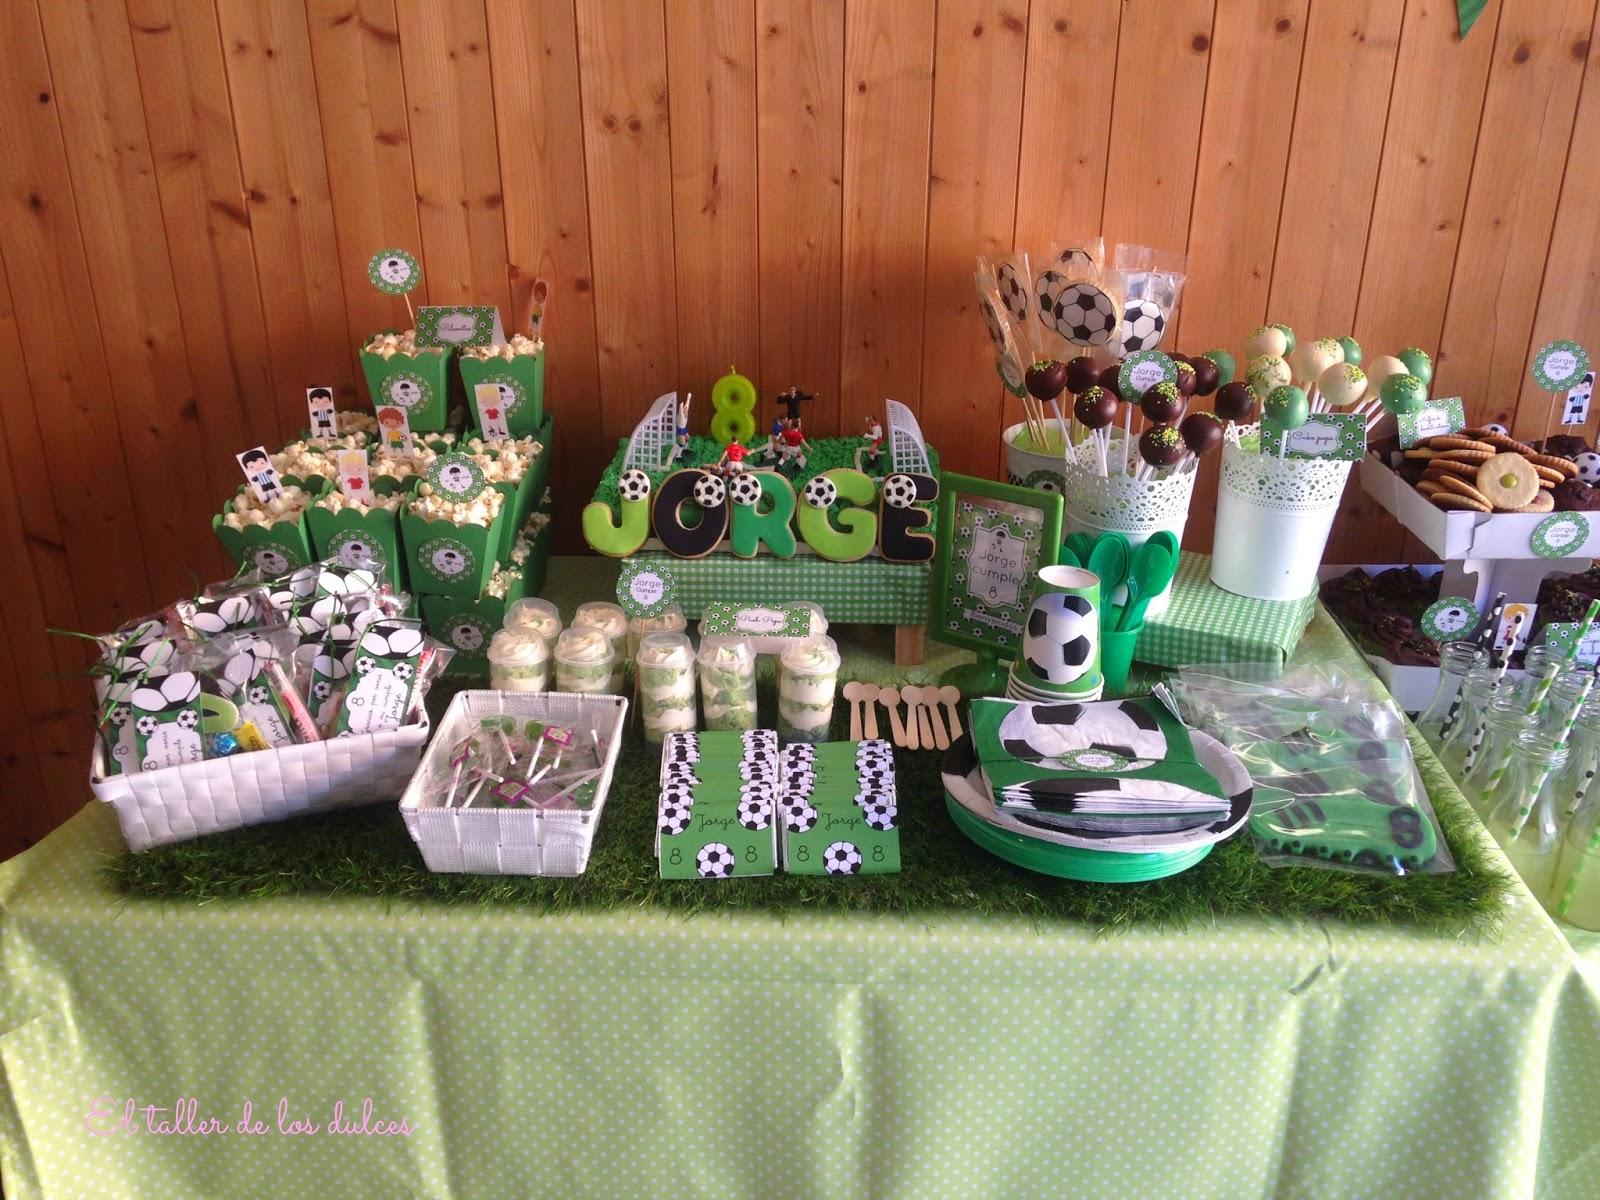 El taller de los dulces gran fiesta de cumplea os con for Fotos de mesas de chuches para bodas